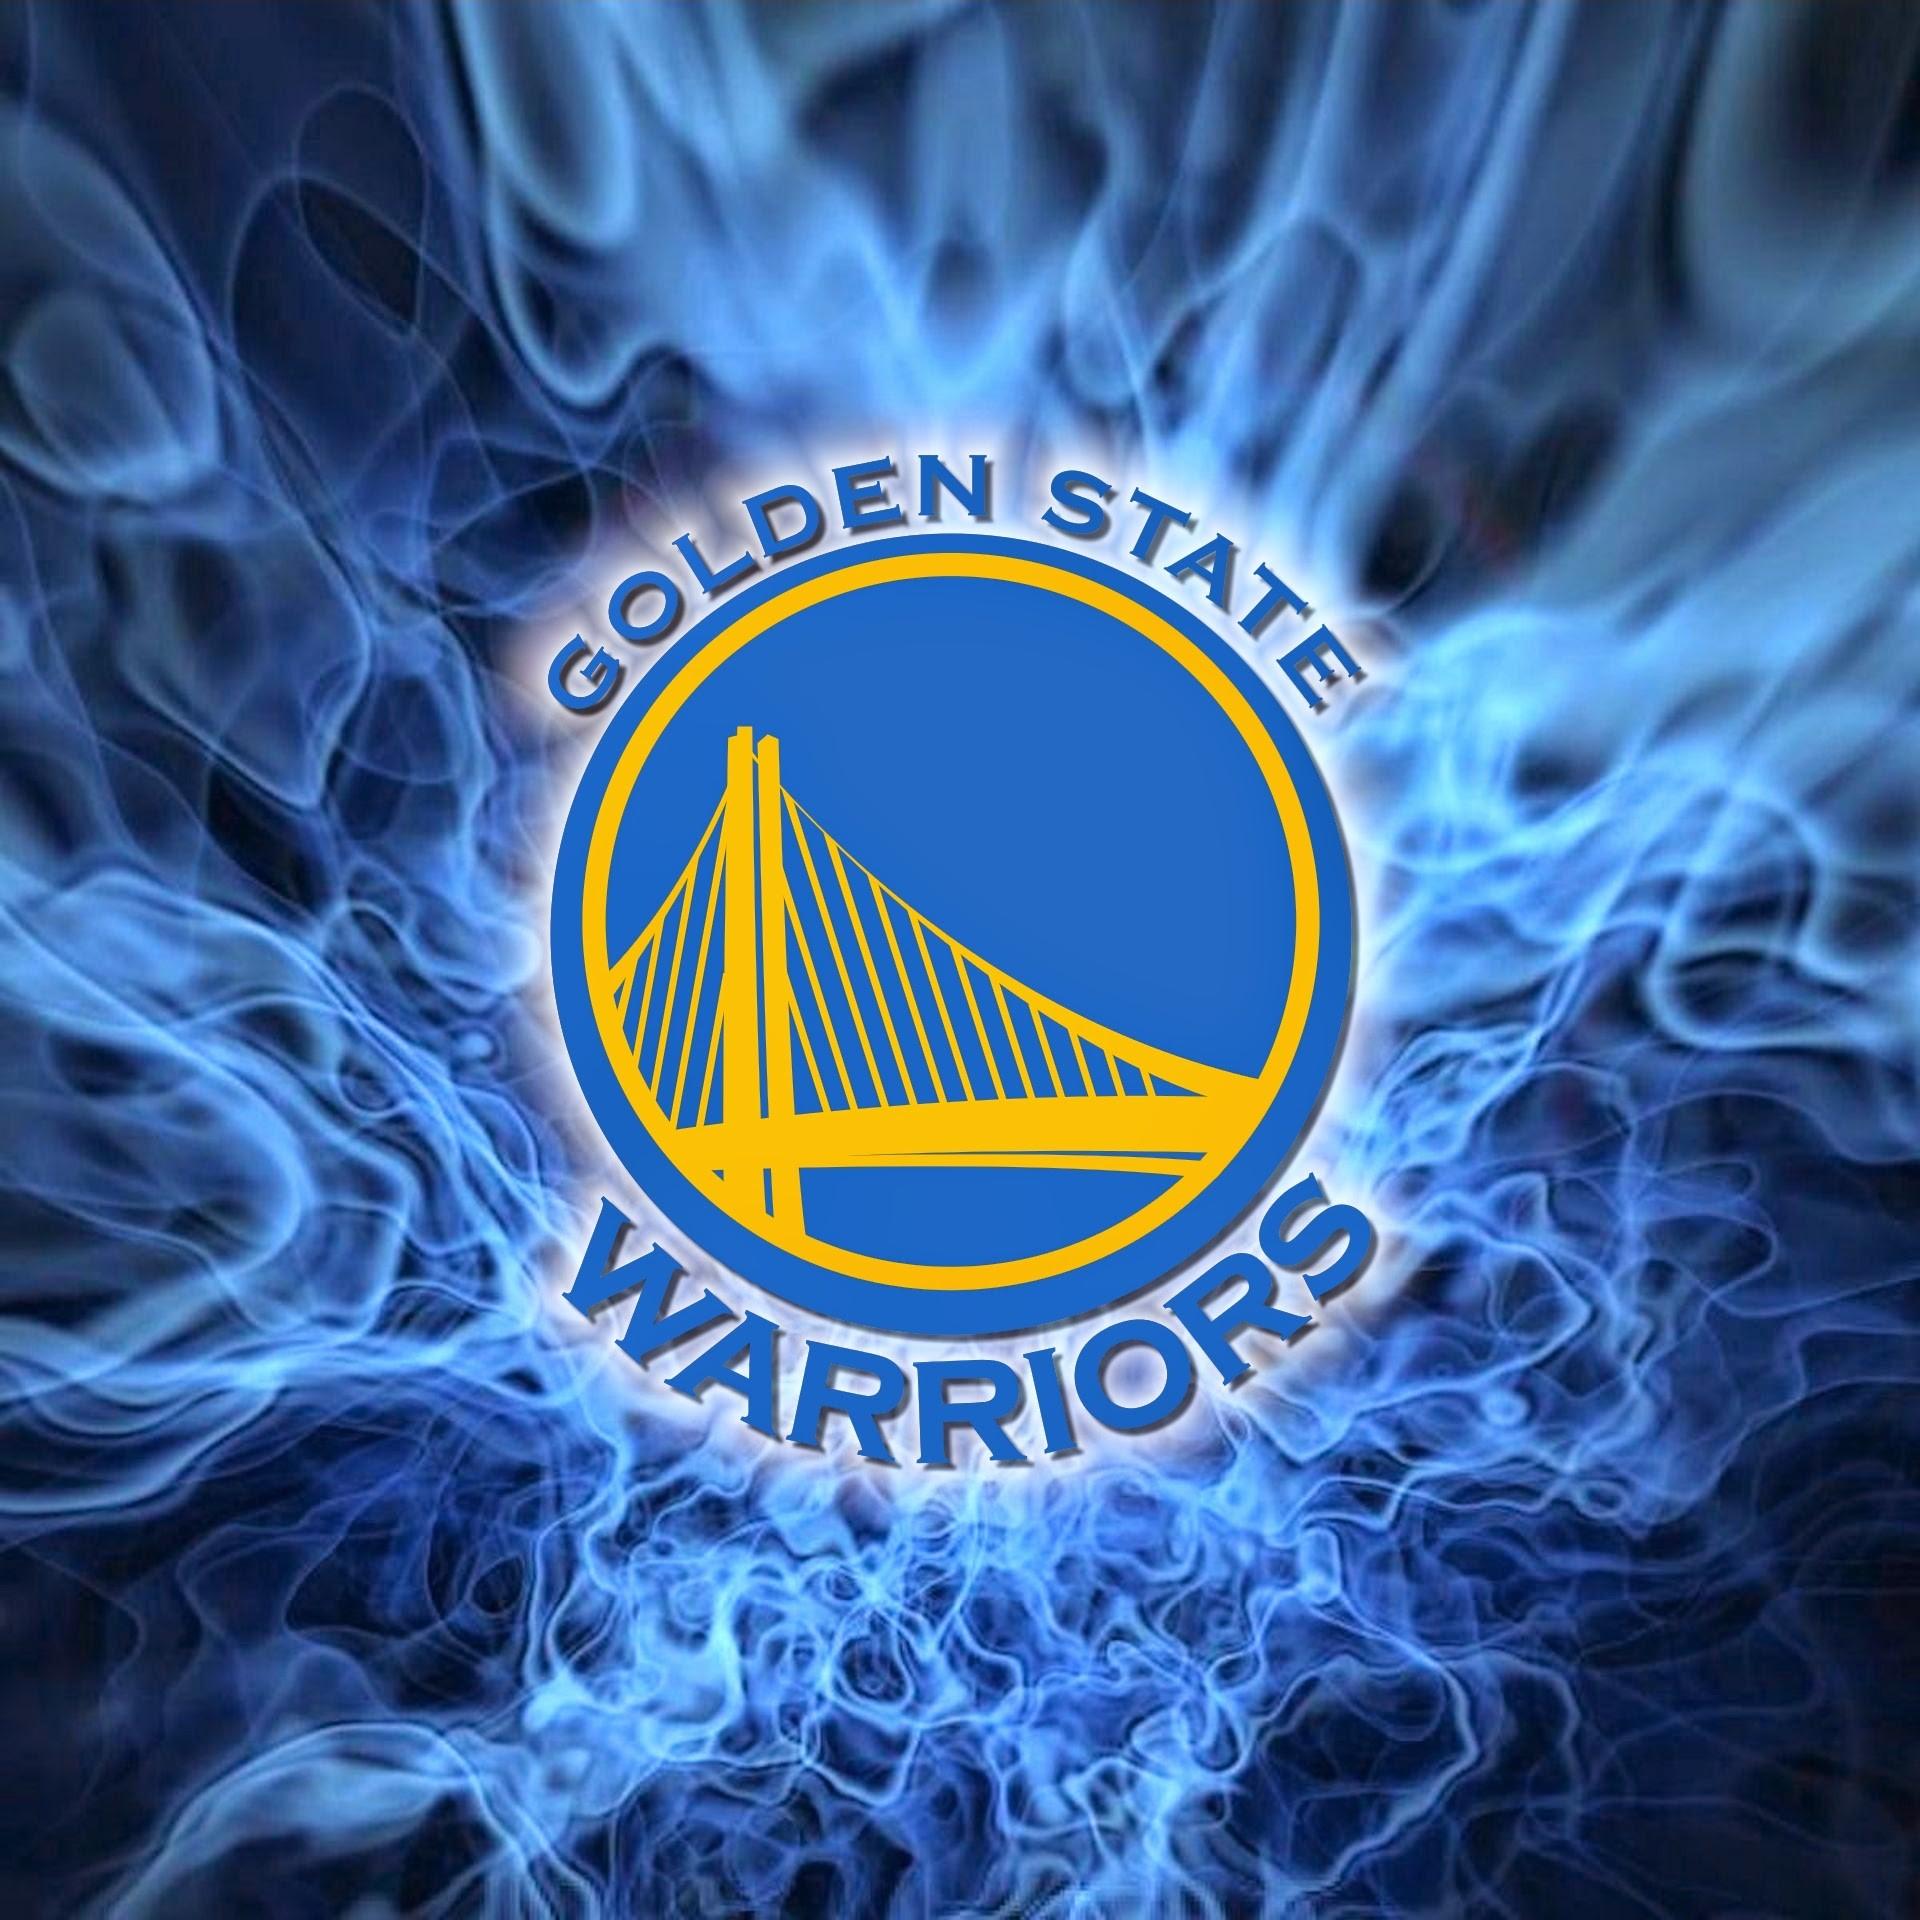 golden state warriors basketball - photo #39